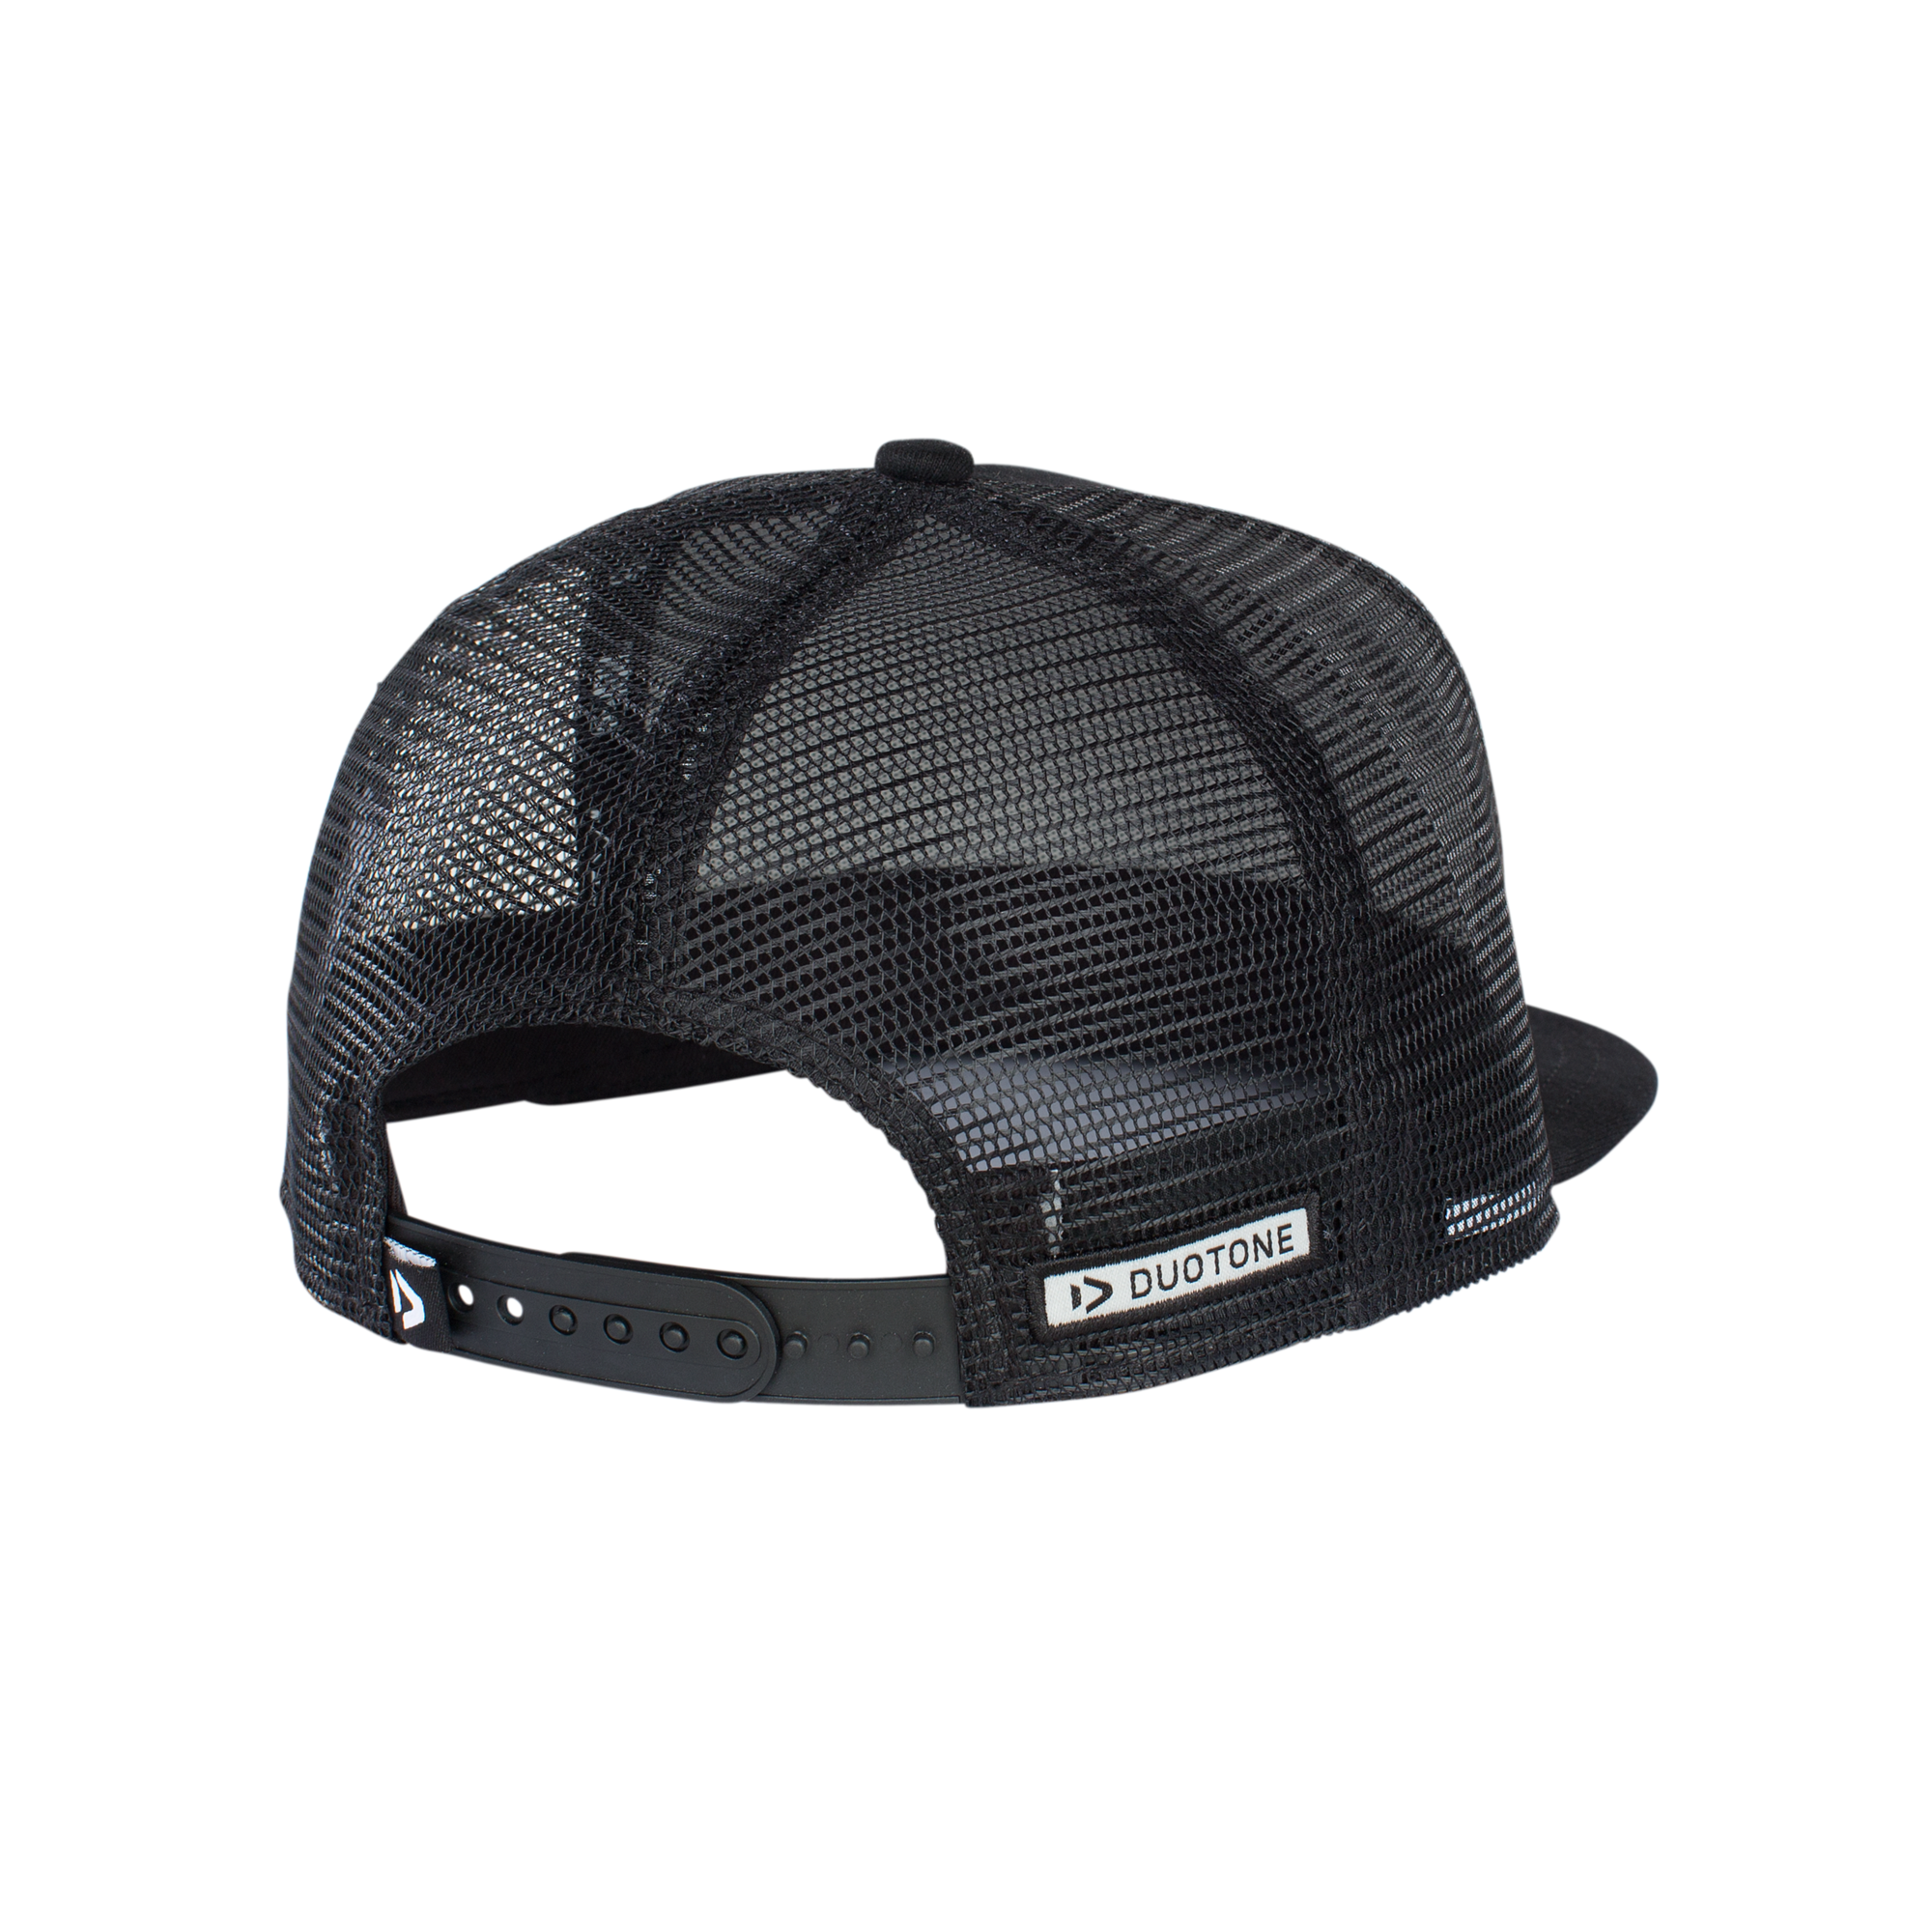 cd5b9f658f37d Duotone New Era Cap 9Fifty A-Frame - Button black 2019